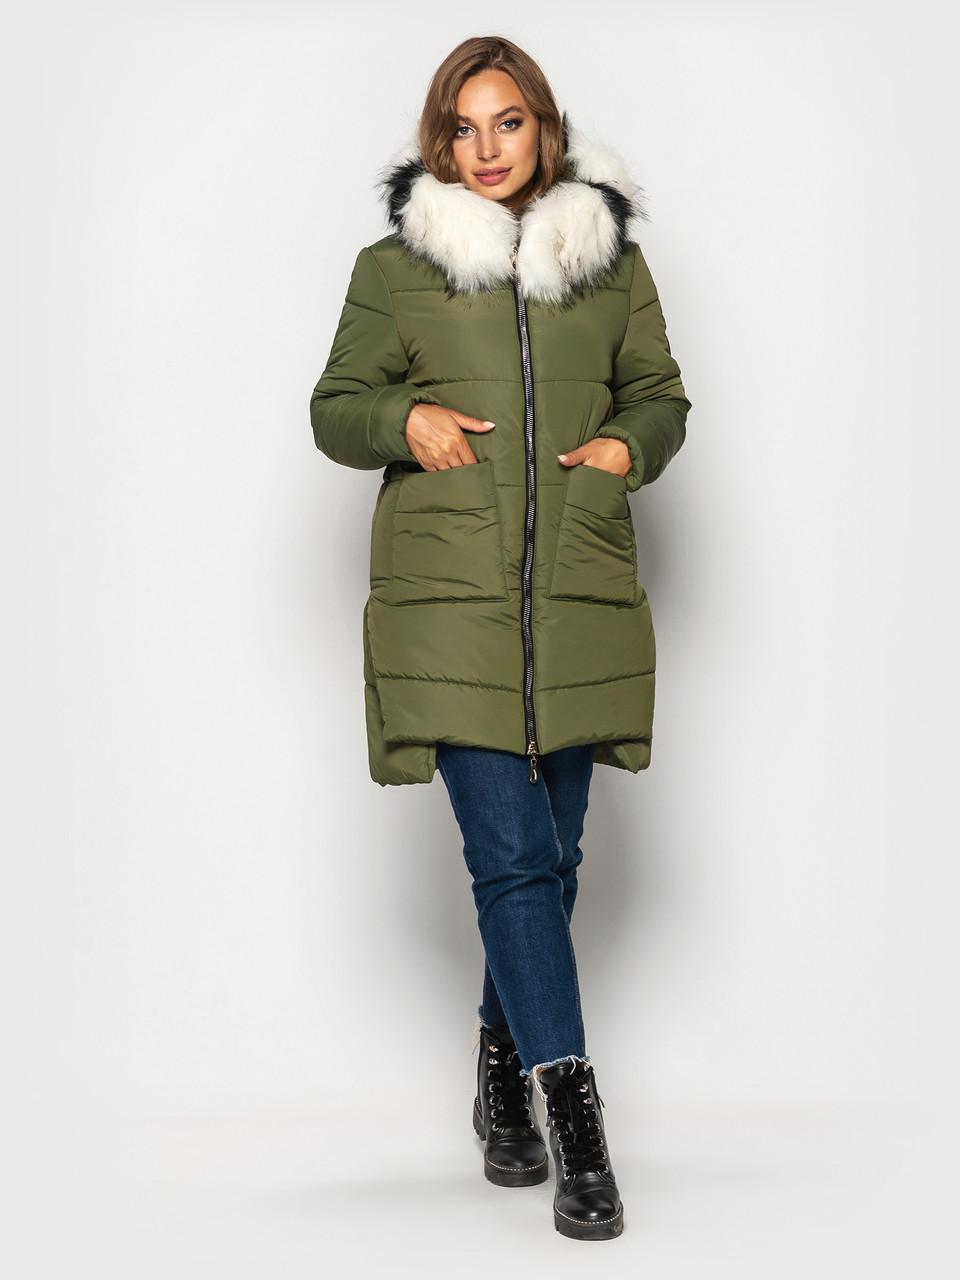 Зимняя куртка К 0079 с 04